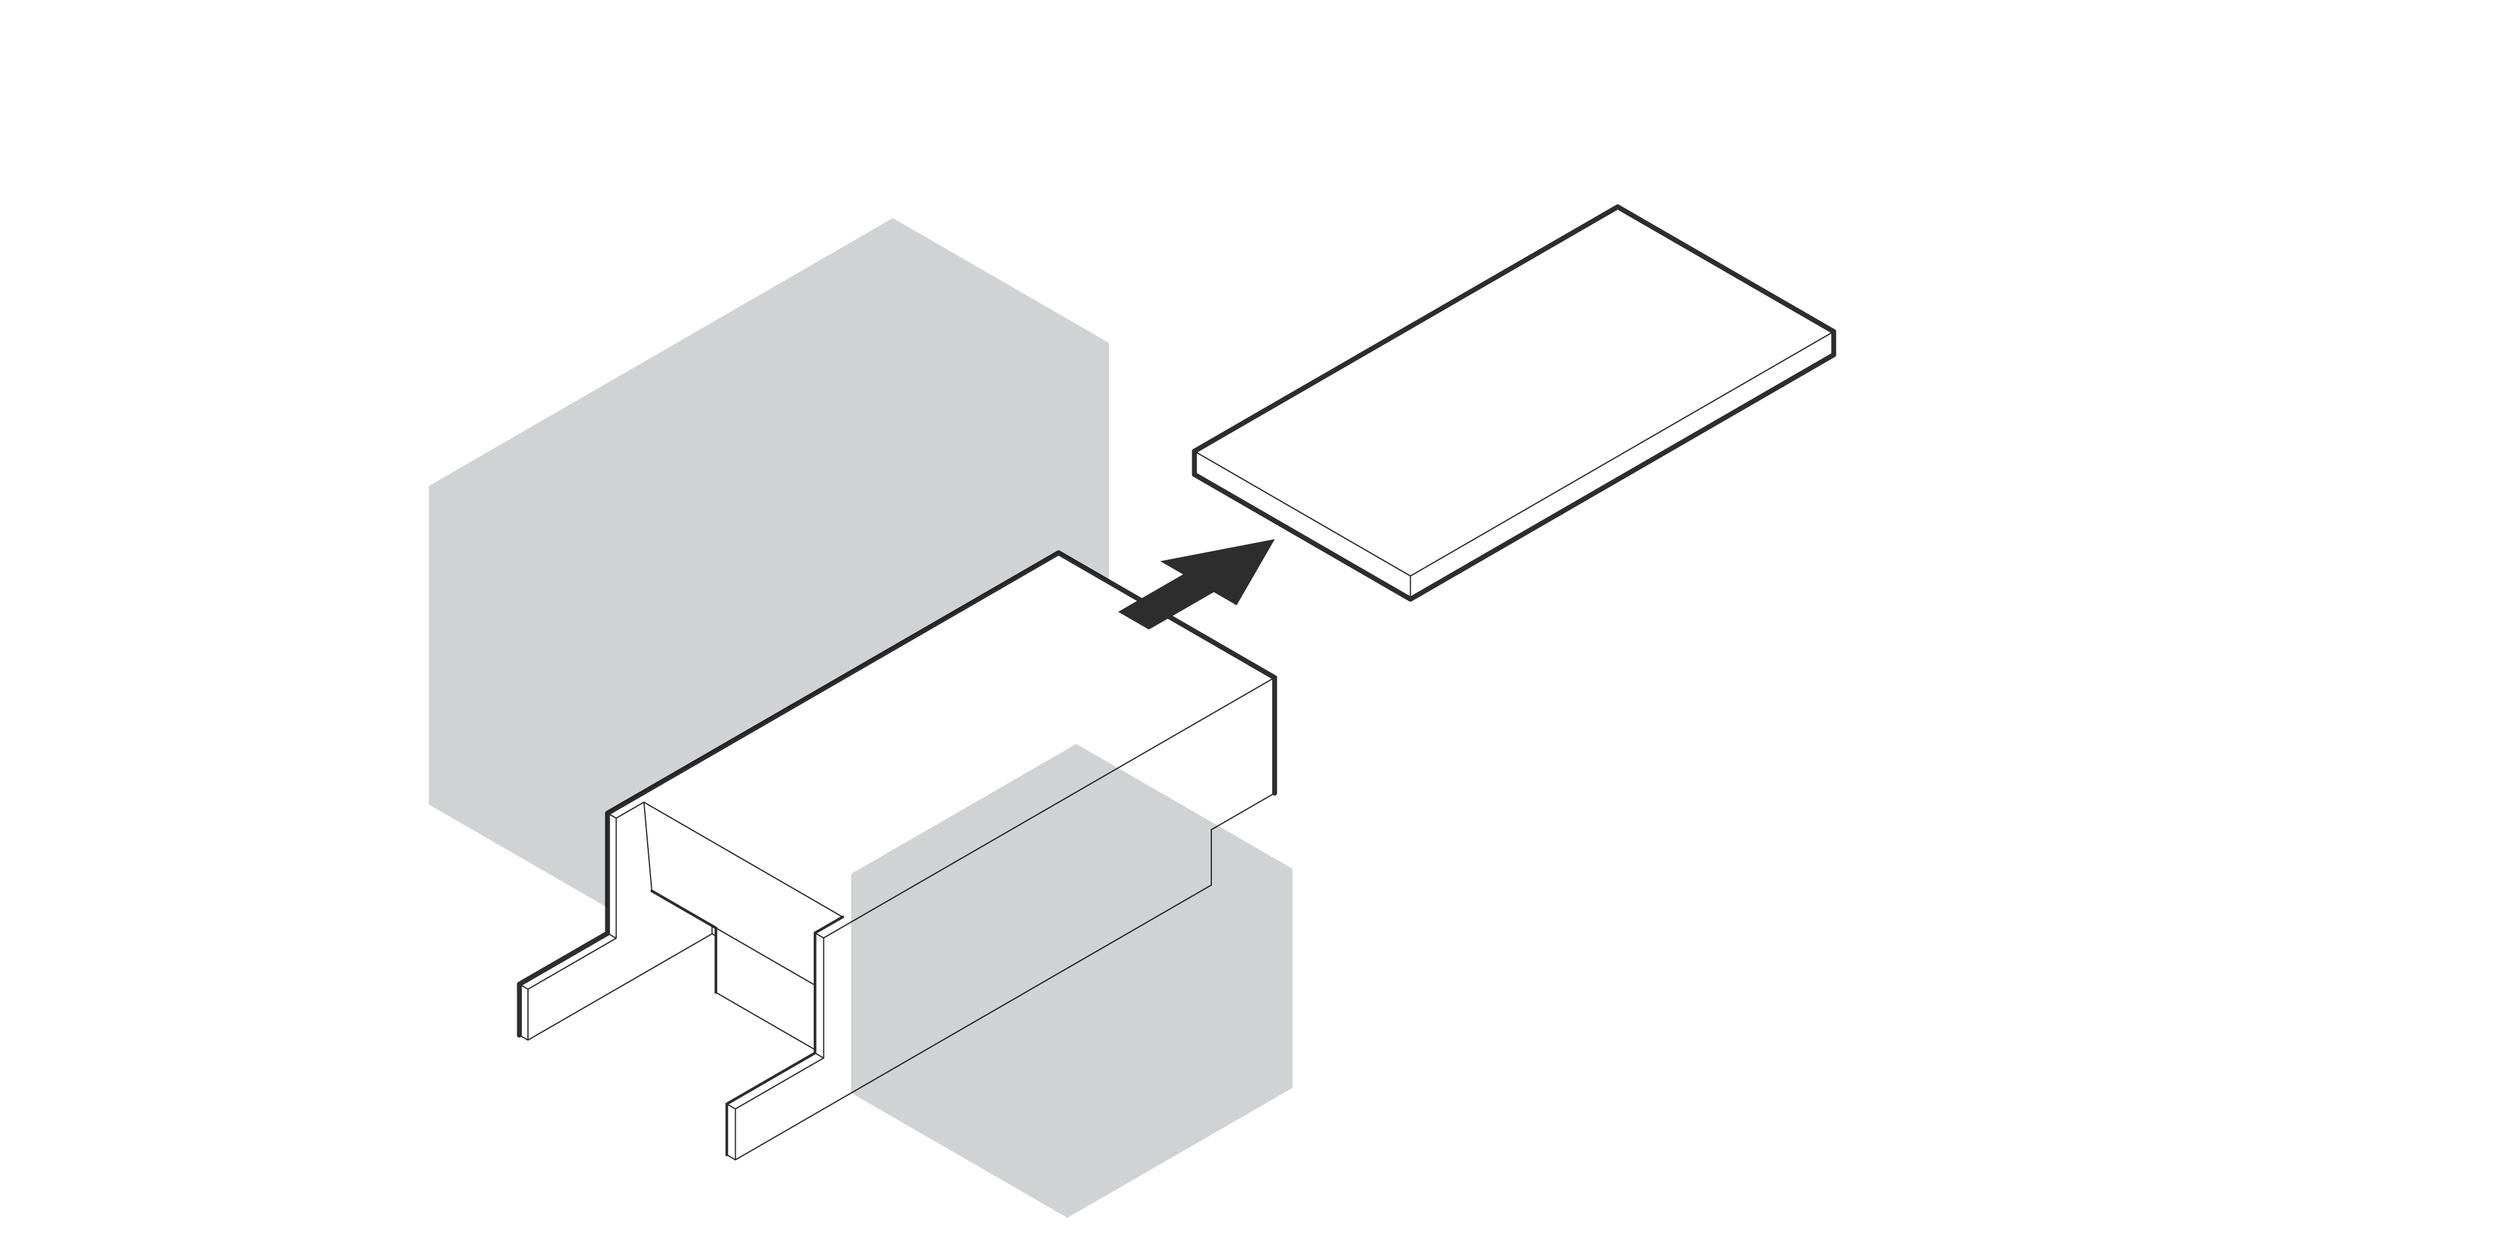 57_Highland-160413-Diagram-04-01.jpg